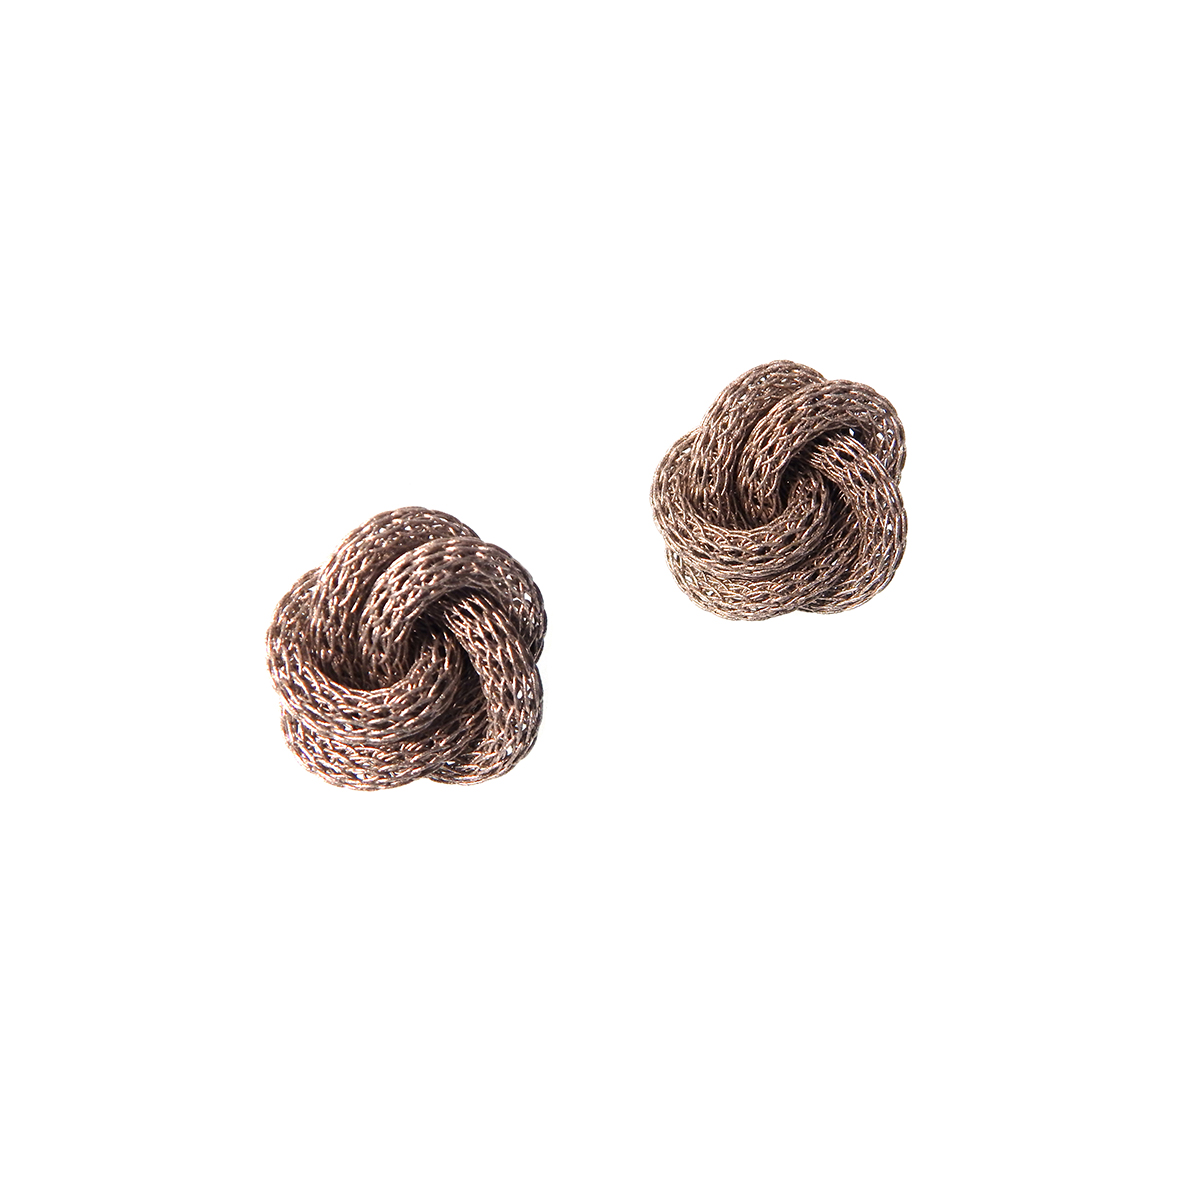 Silver mesh knot stud earrings by Sarah Cavender